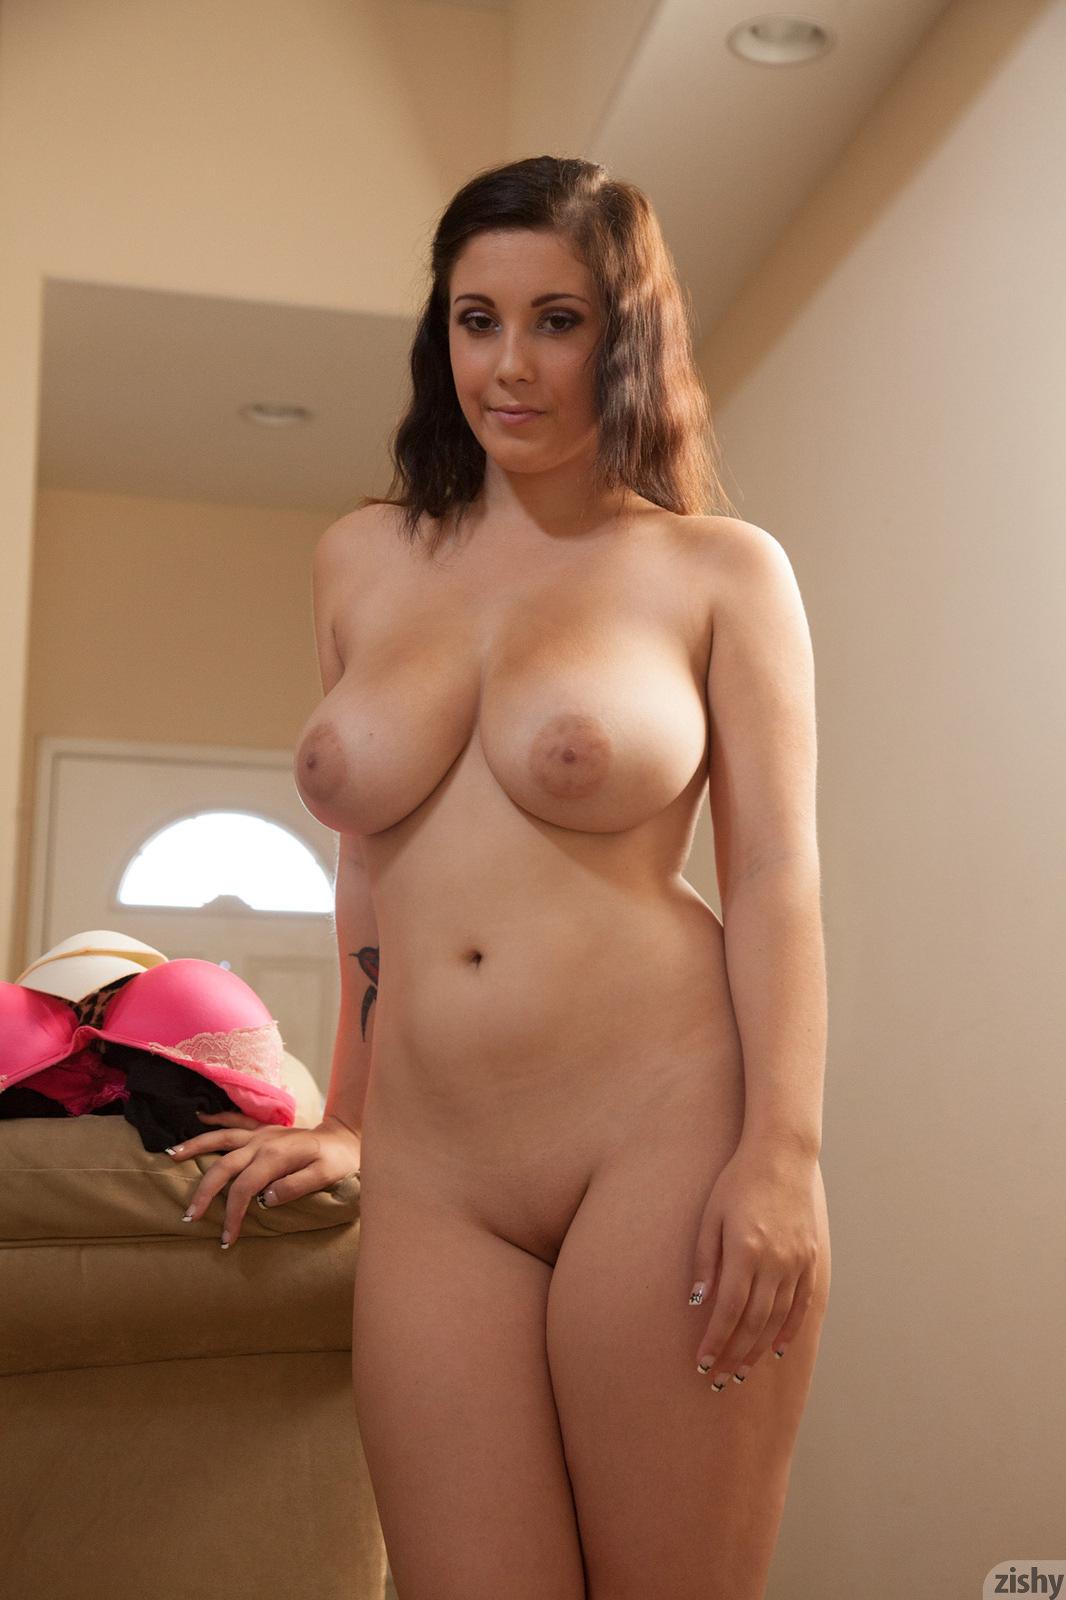 sexy naked curvy women pics